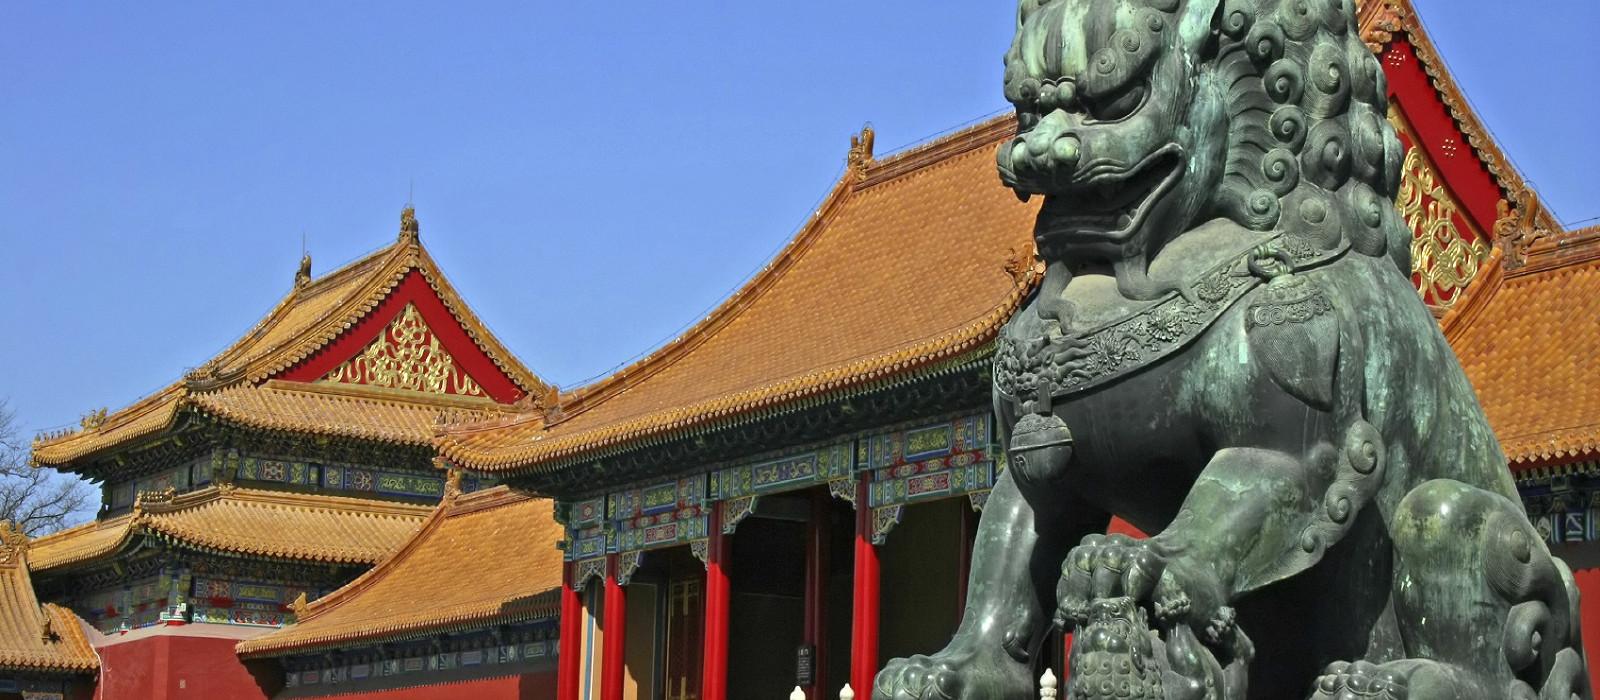 Reiseziel Peking (Beijing) China